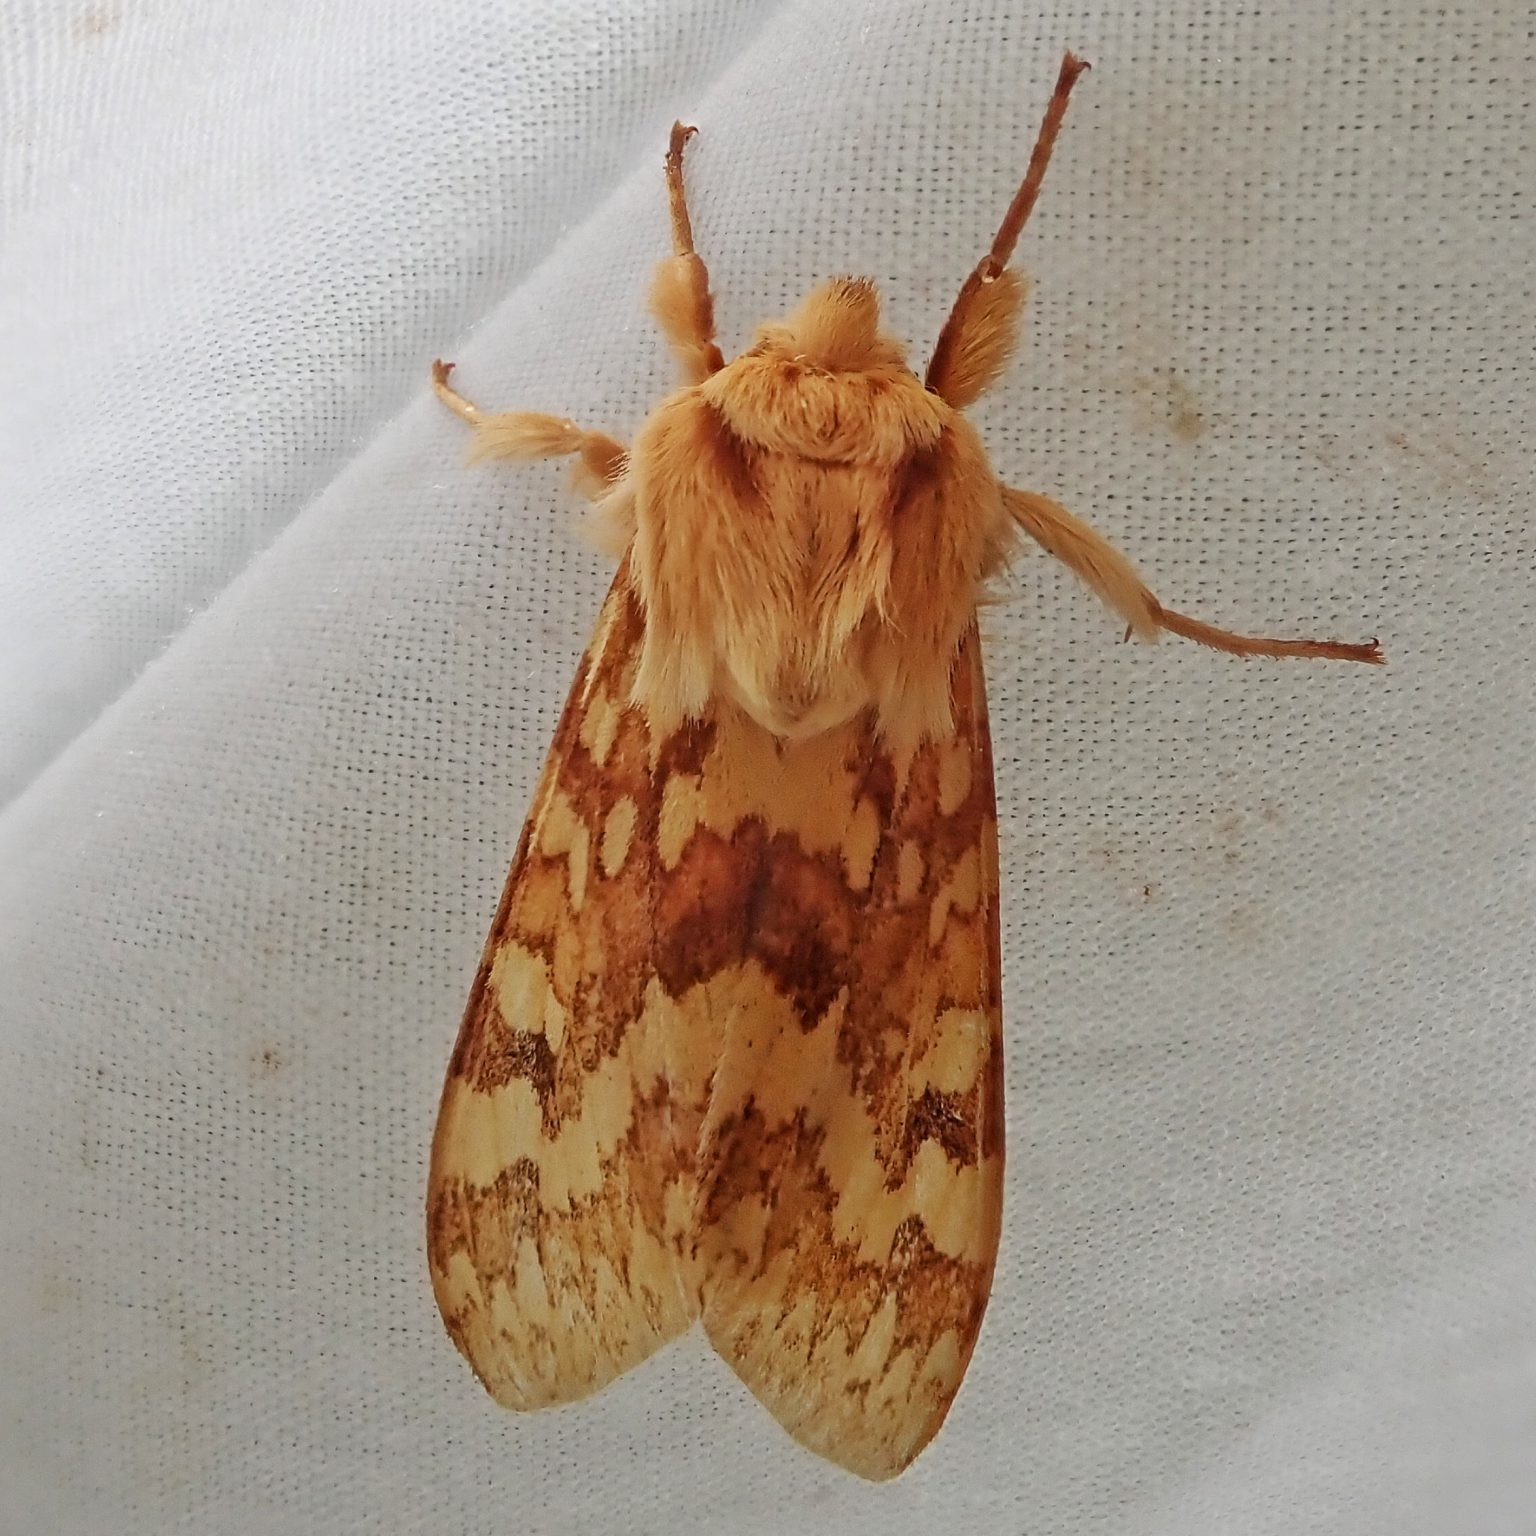 Lophocampa macuata